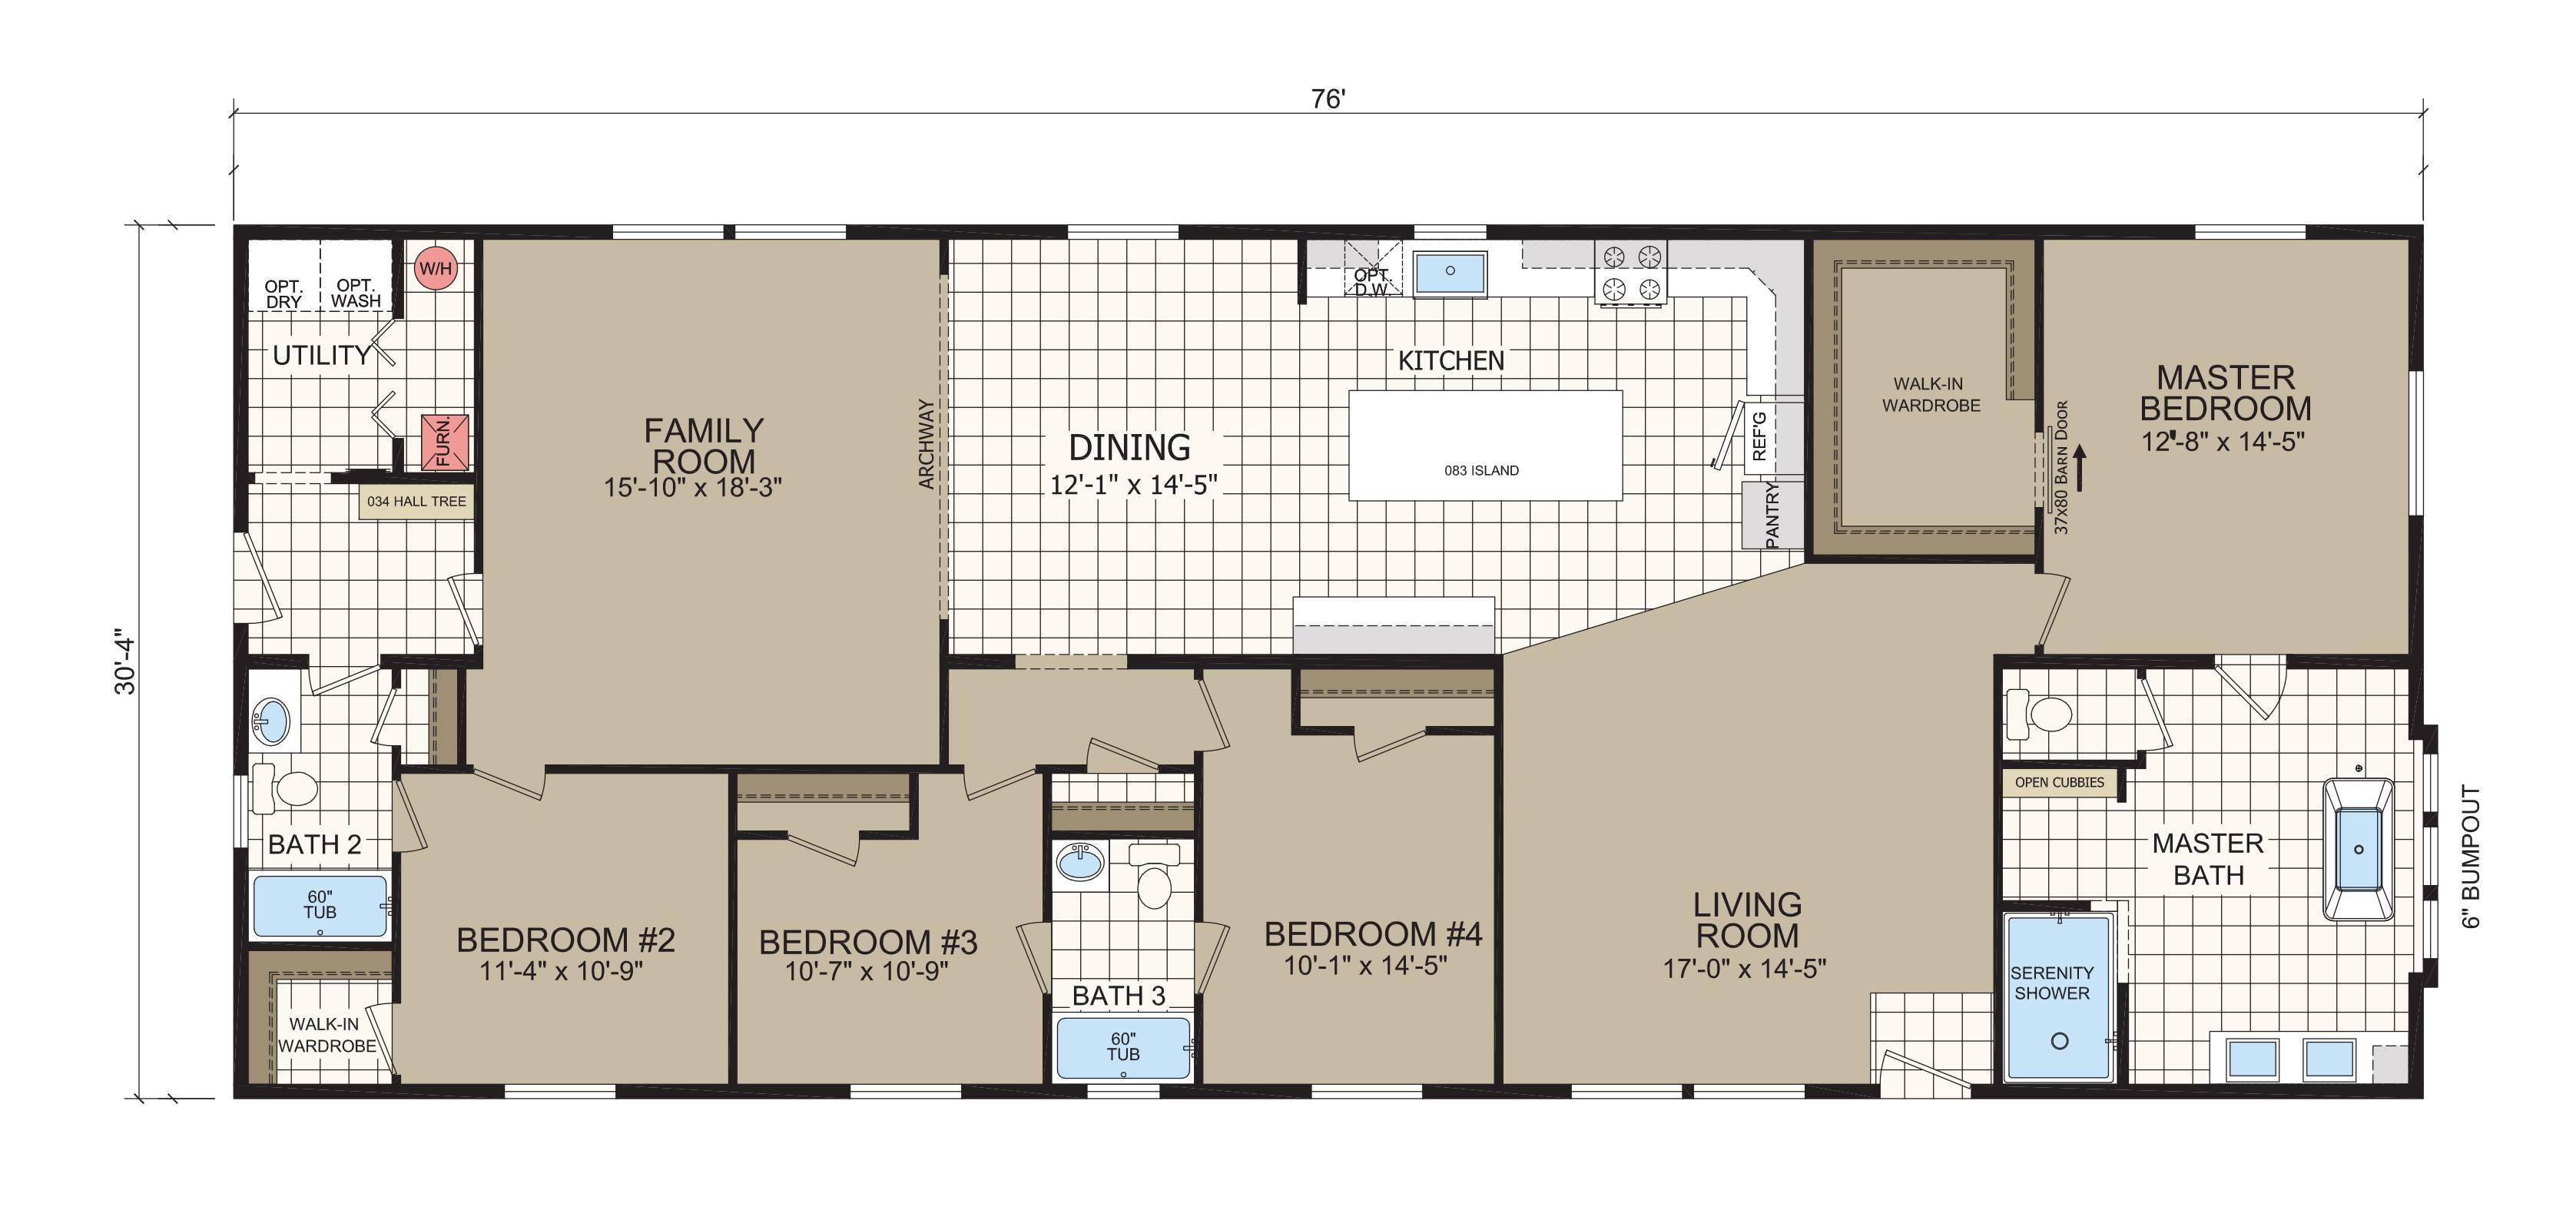 floorplan image for unit 398